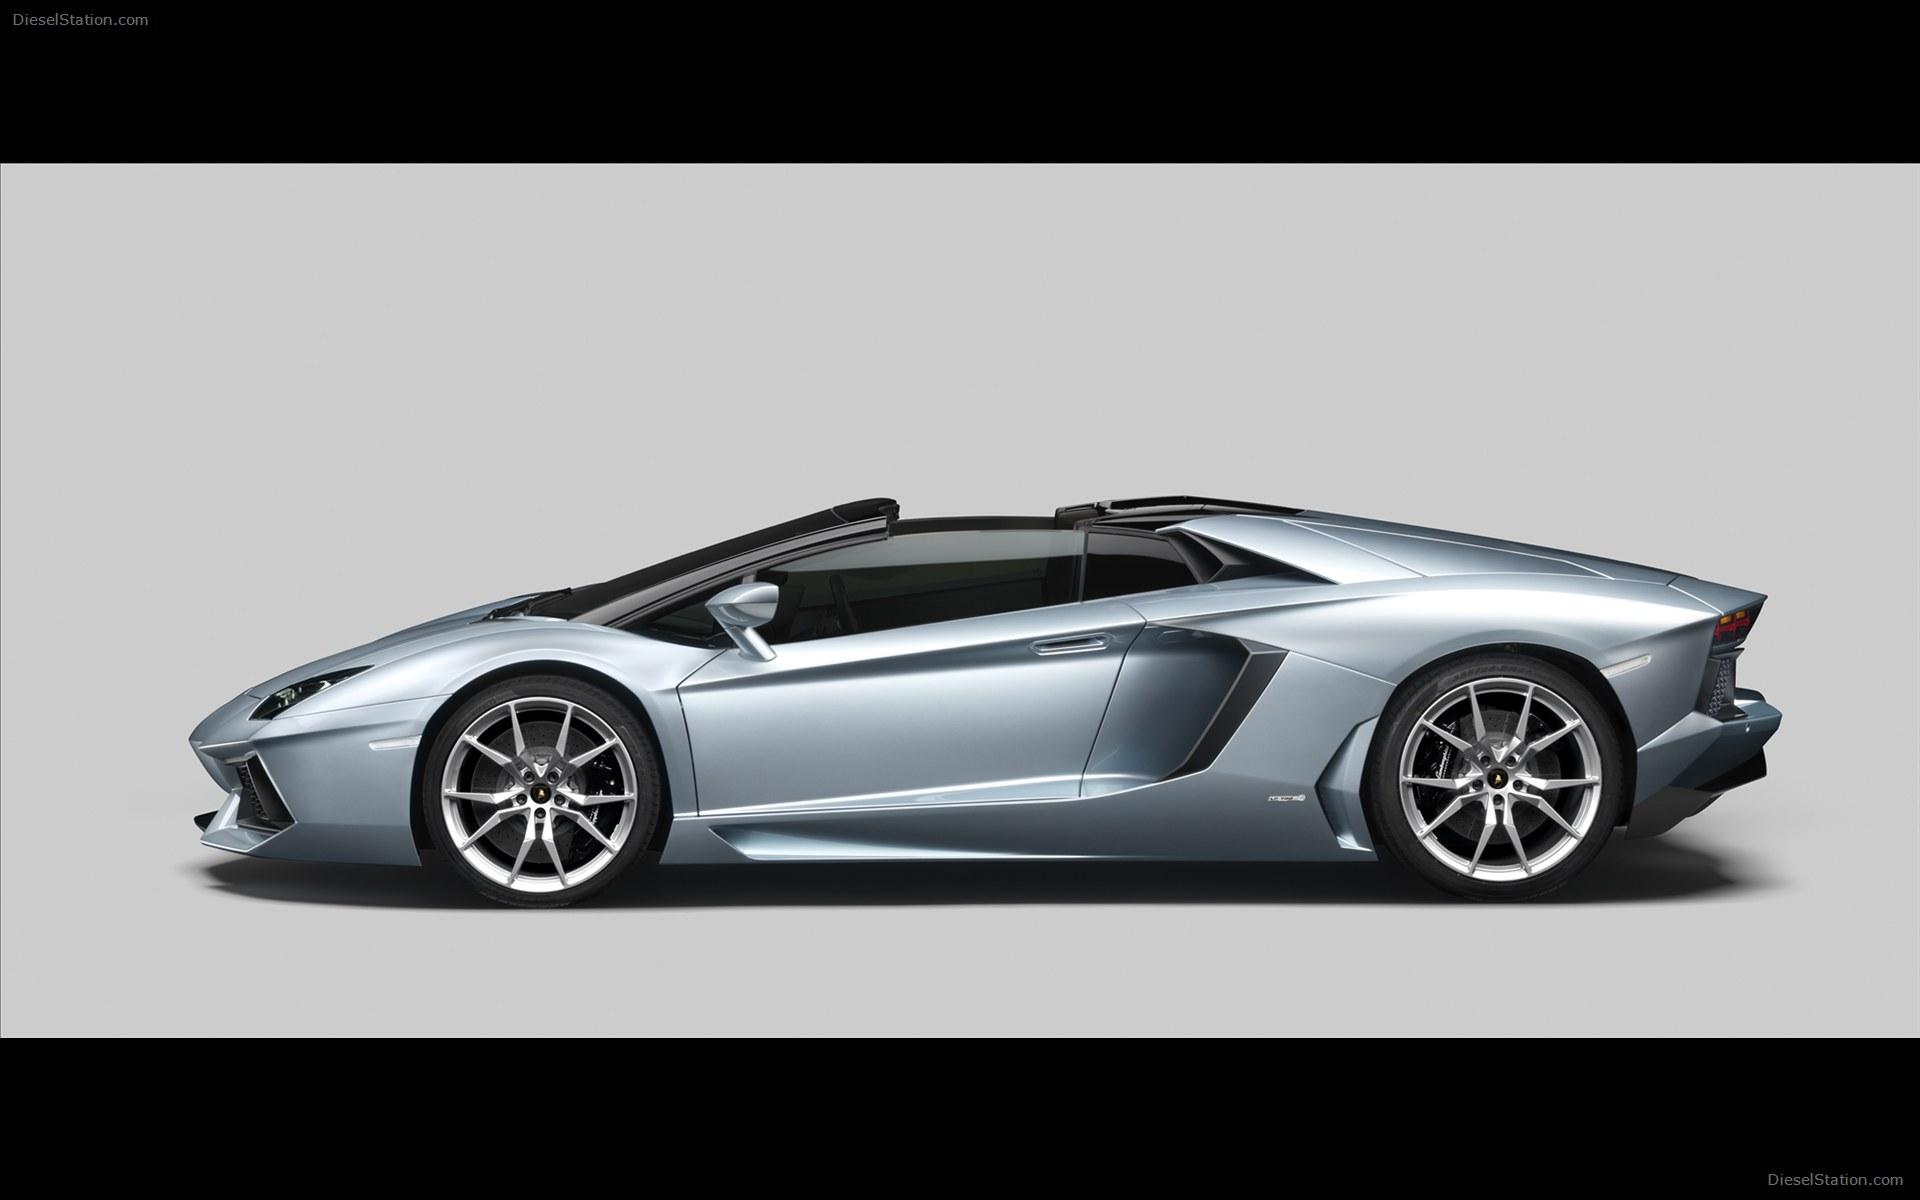 LamborghiniAventador 12 Car Desktop Background